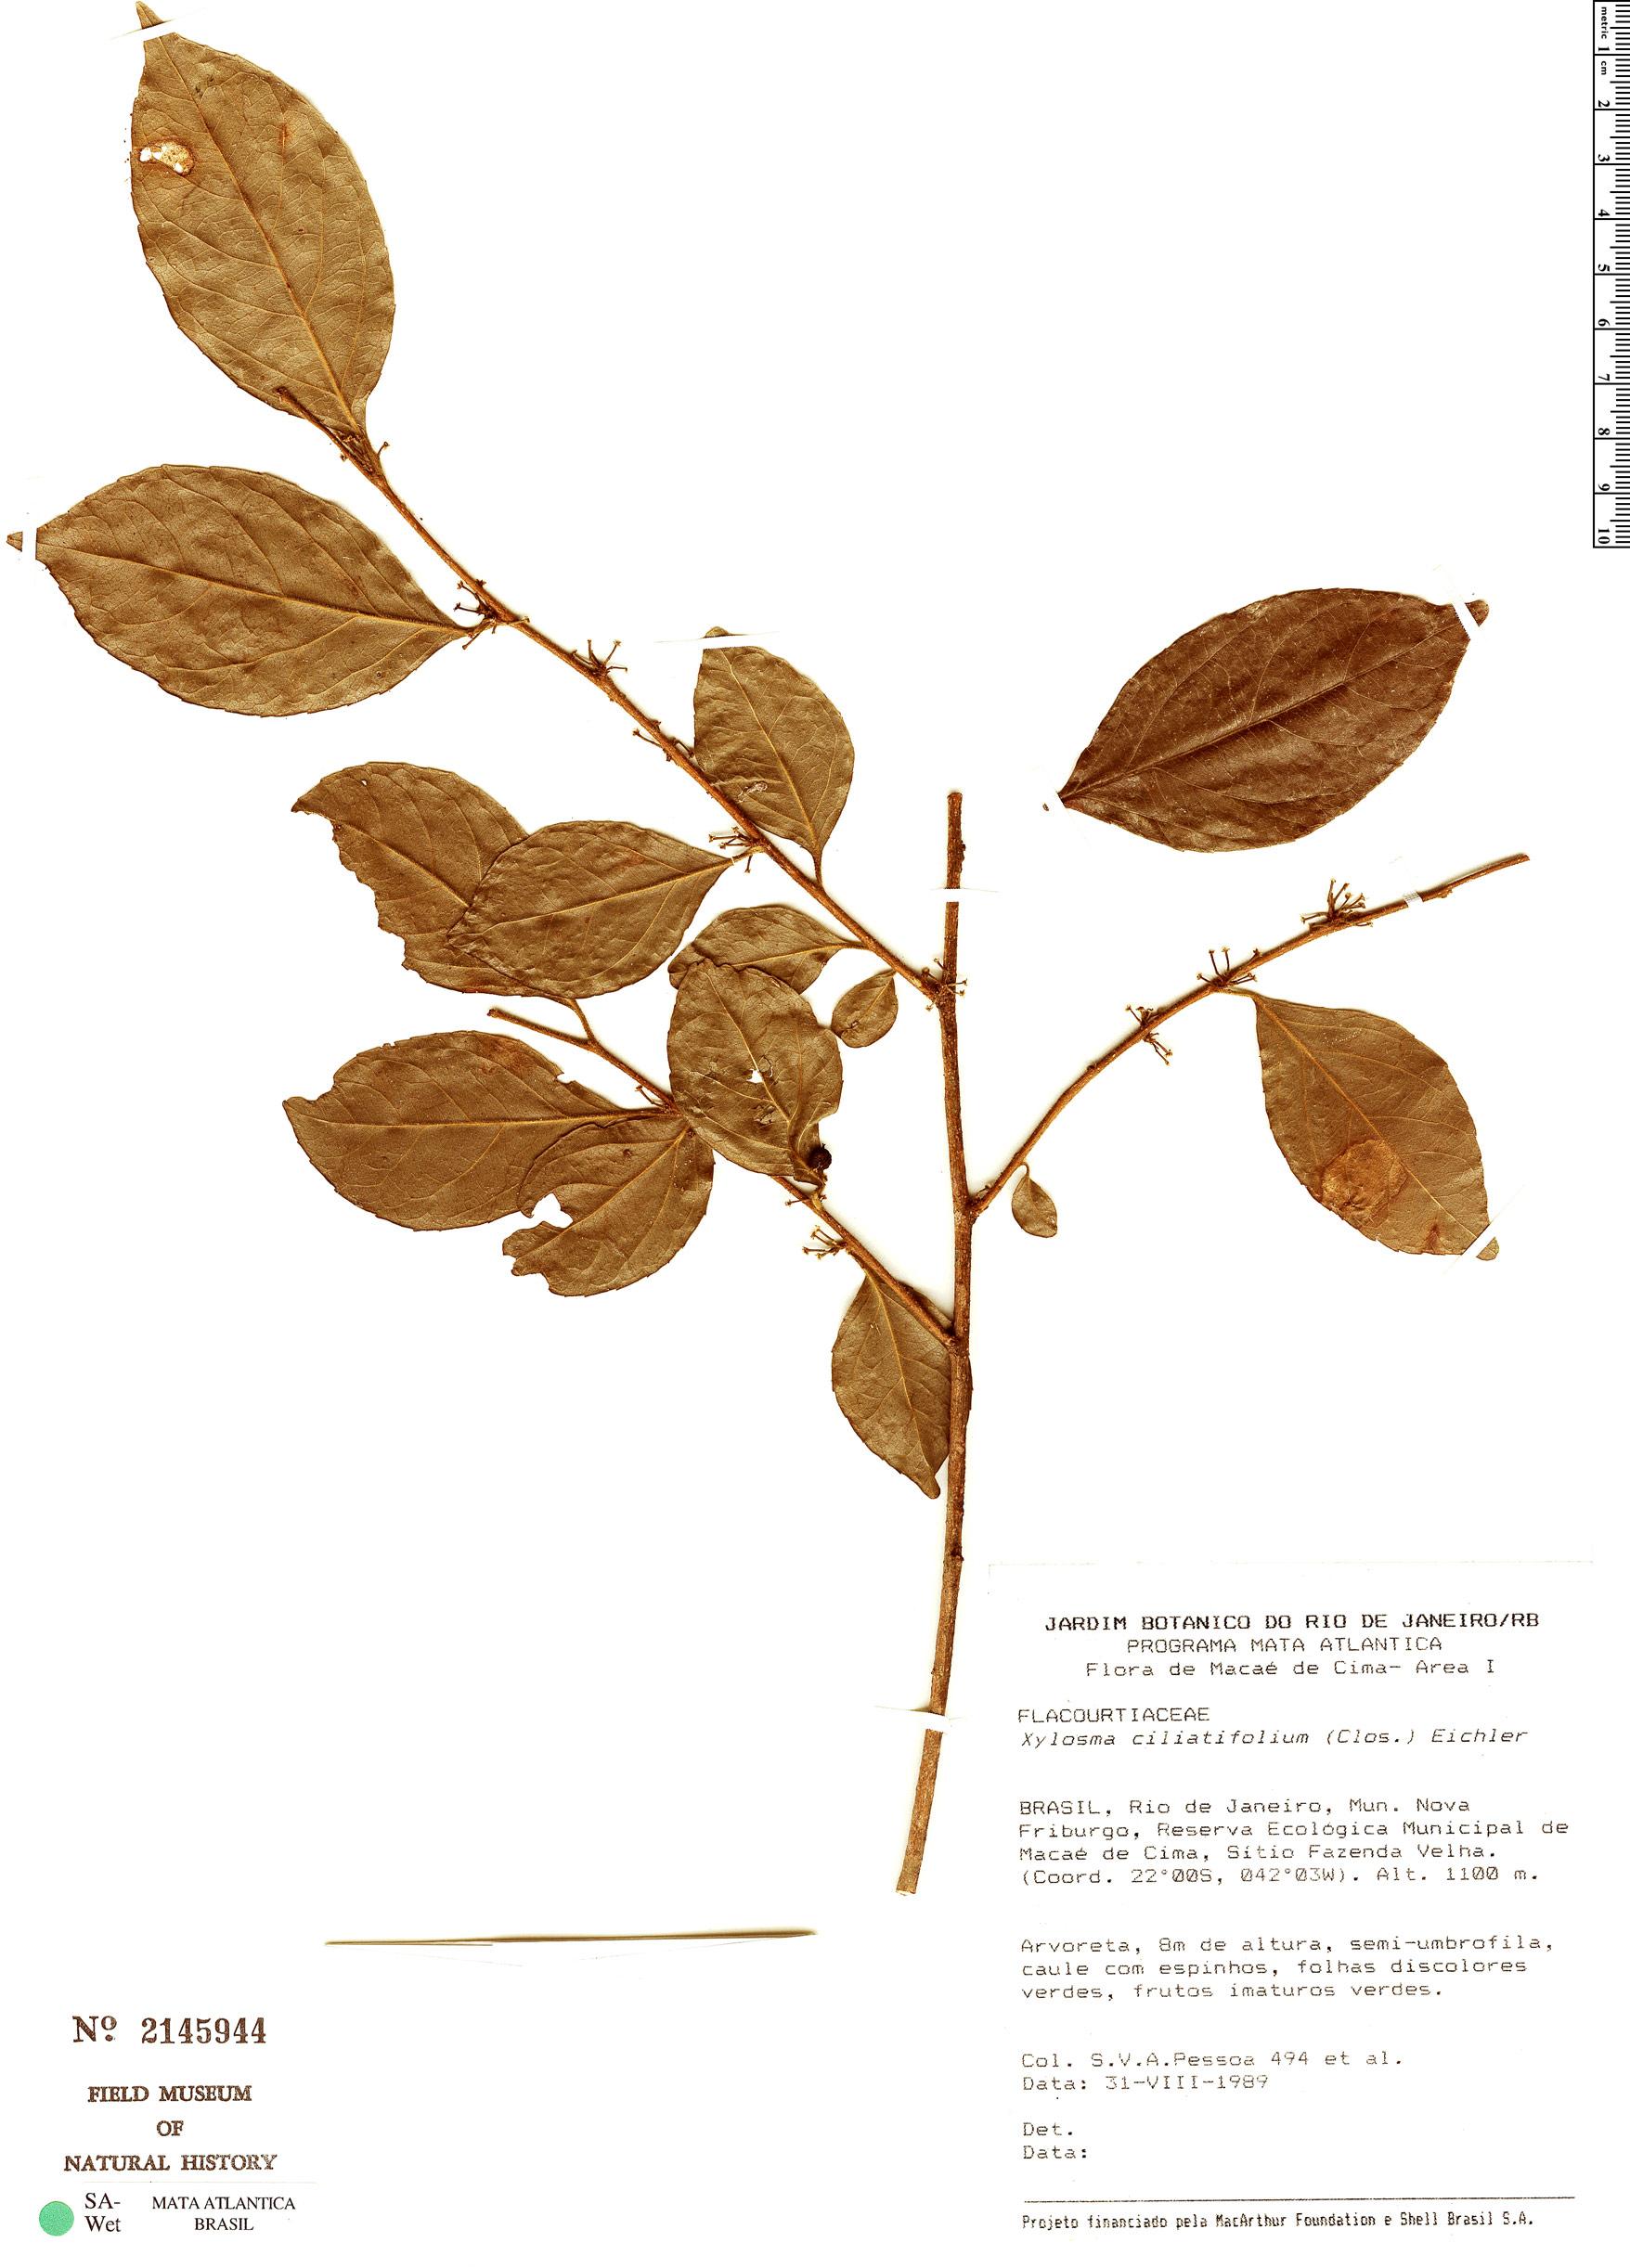 Specimen: Xylosma ciliatifolia